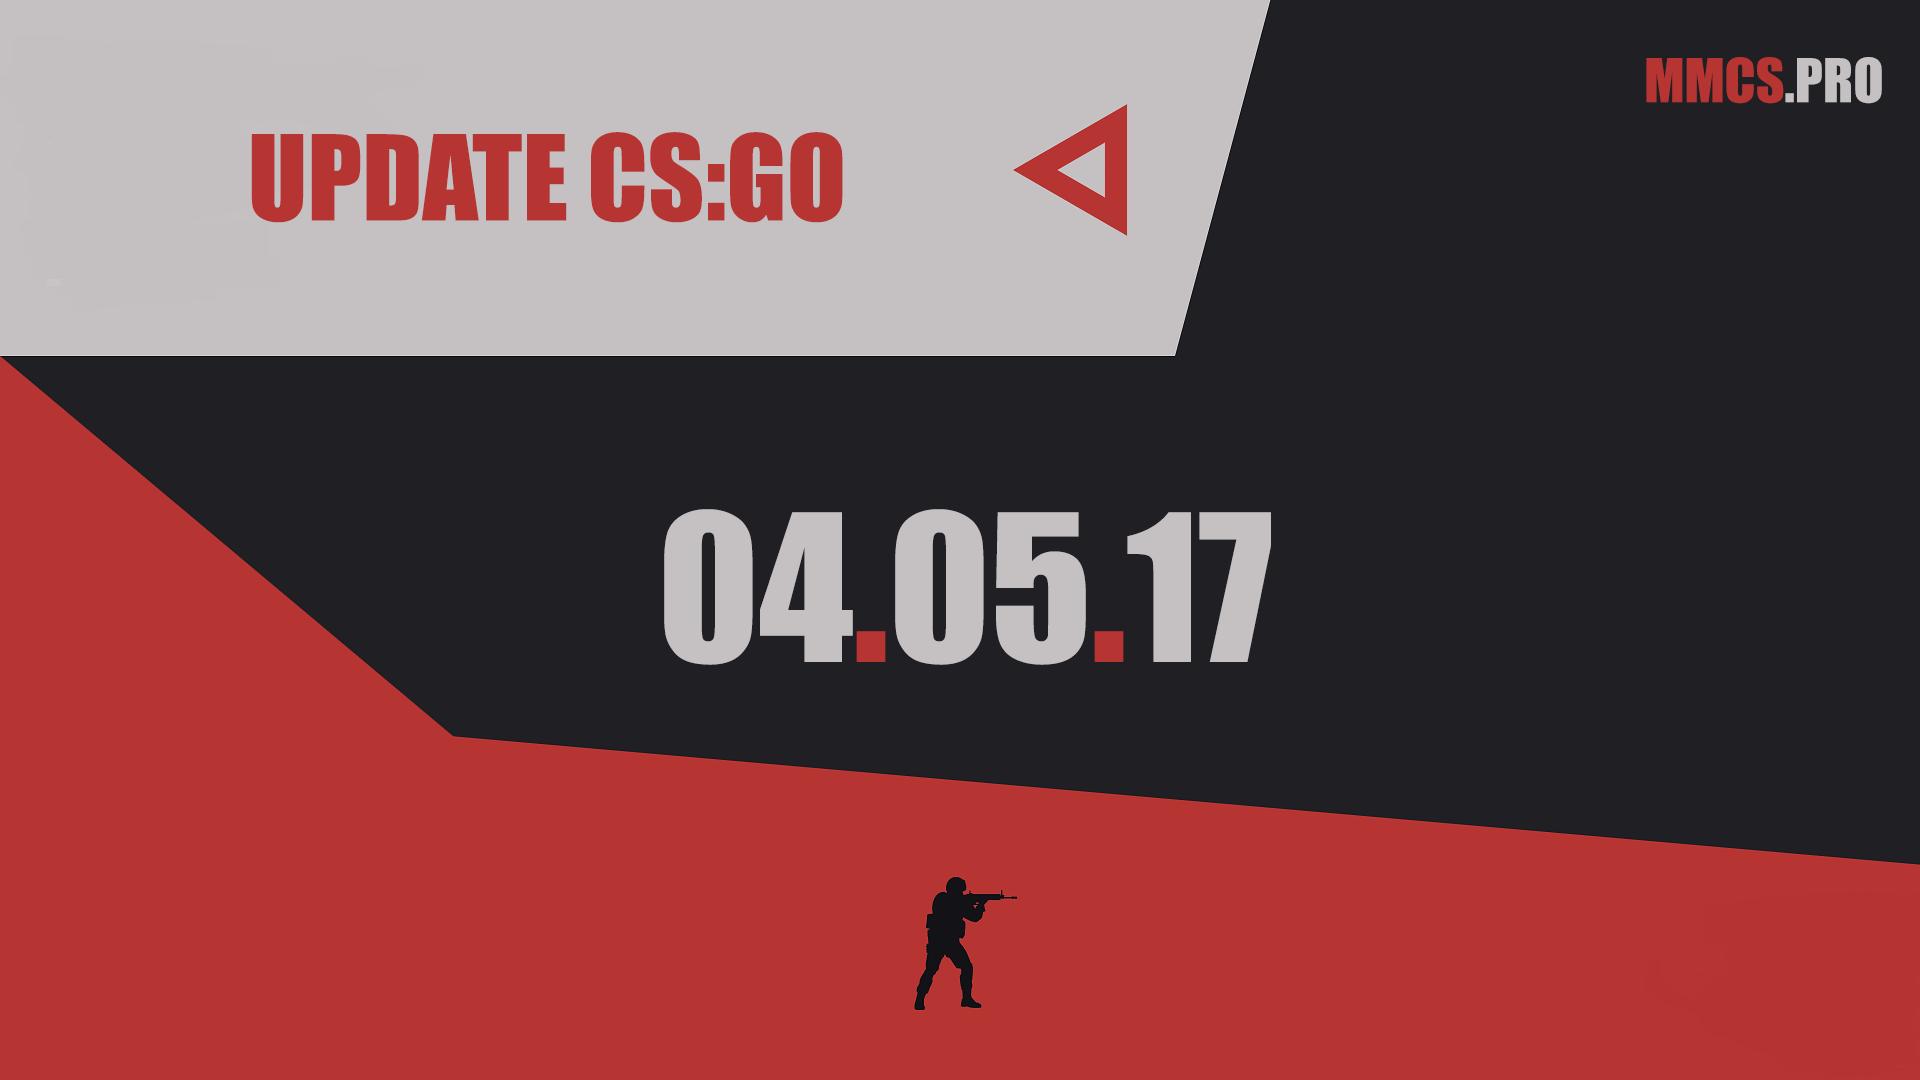 https://mmcs.pro/update-csgo-04-05-2017-valve/